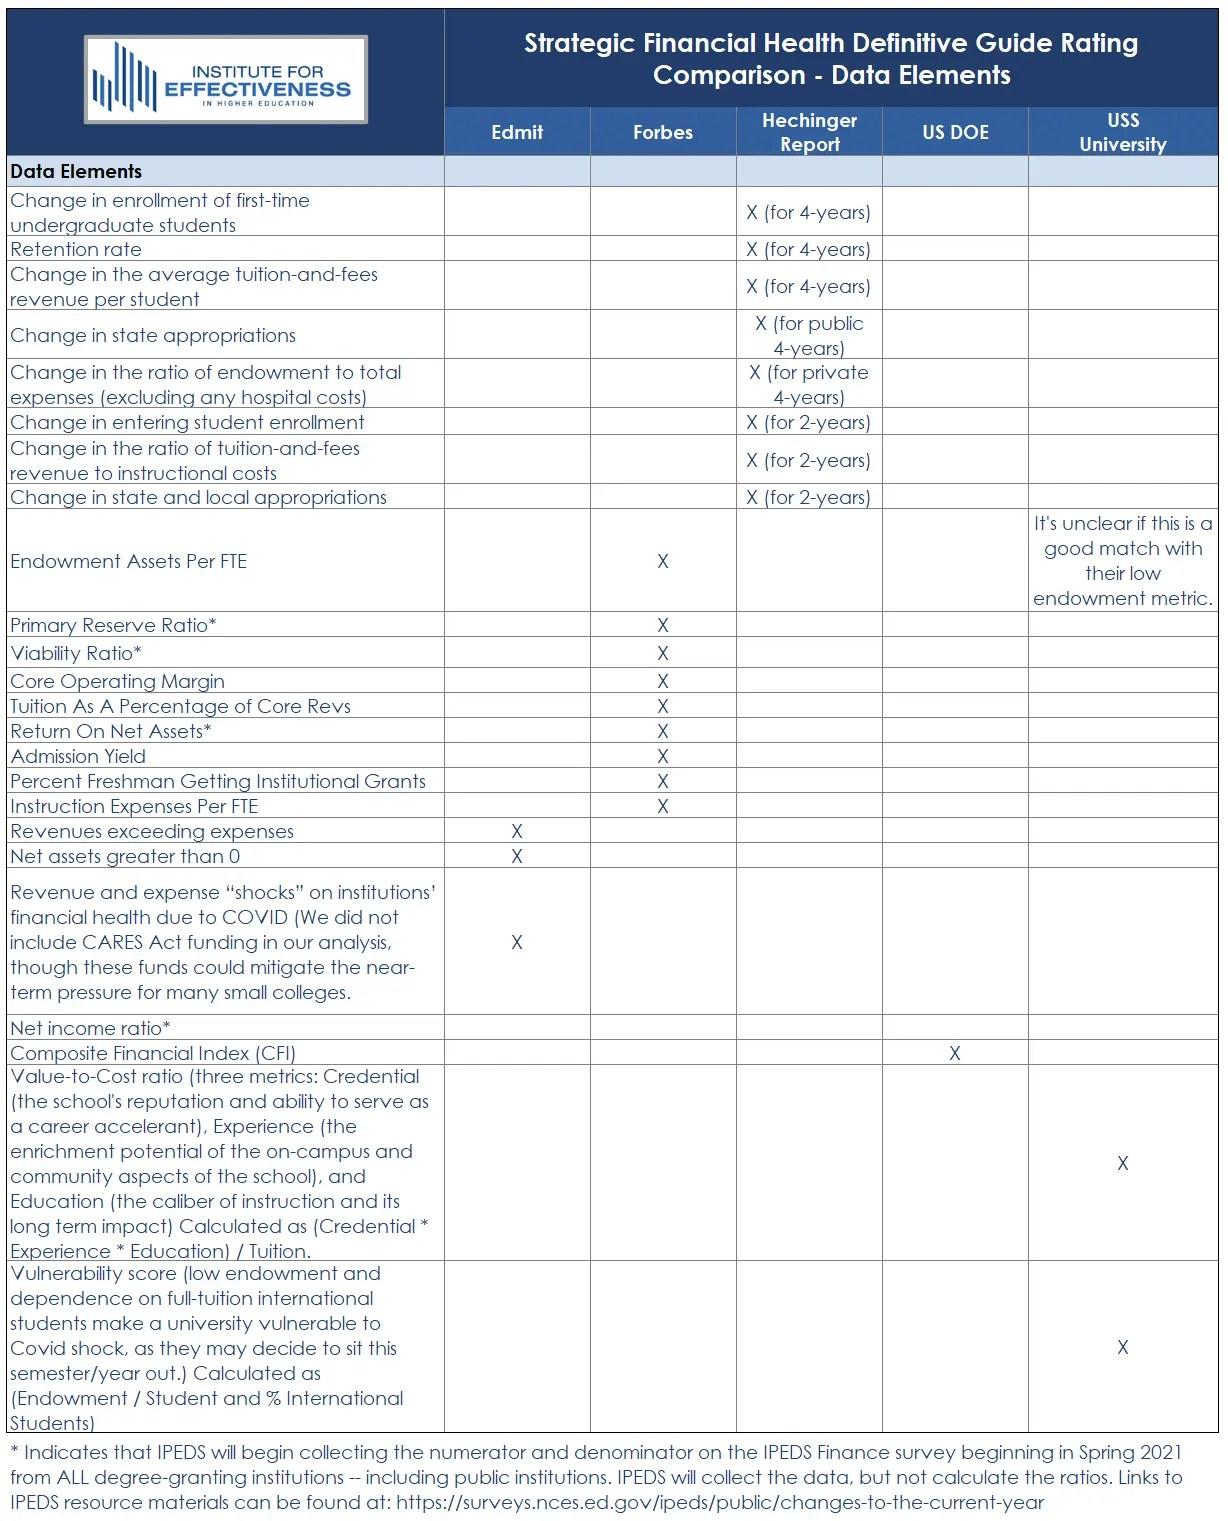 Strategic Financial Health Definitive Guide Rating Comparison - Data Element Matrix